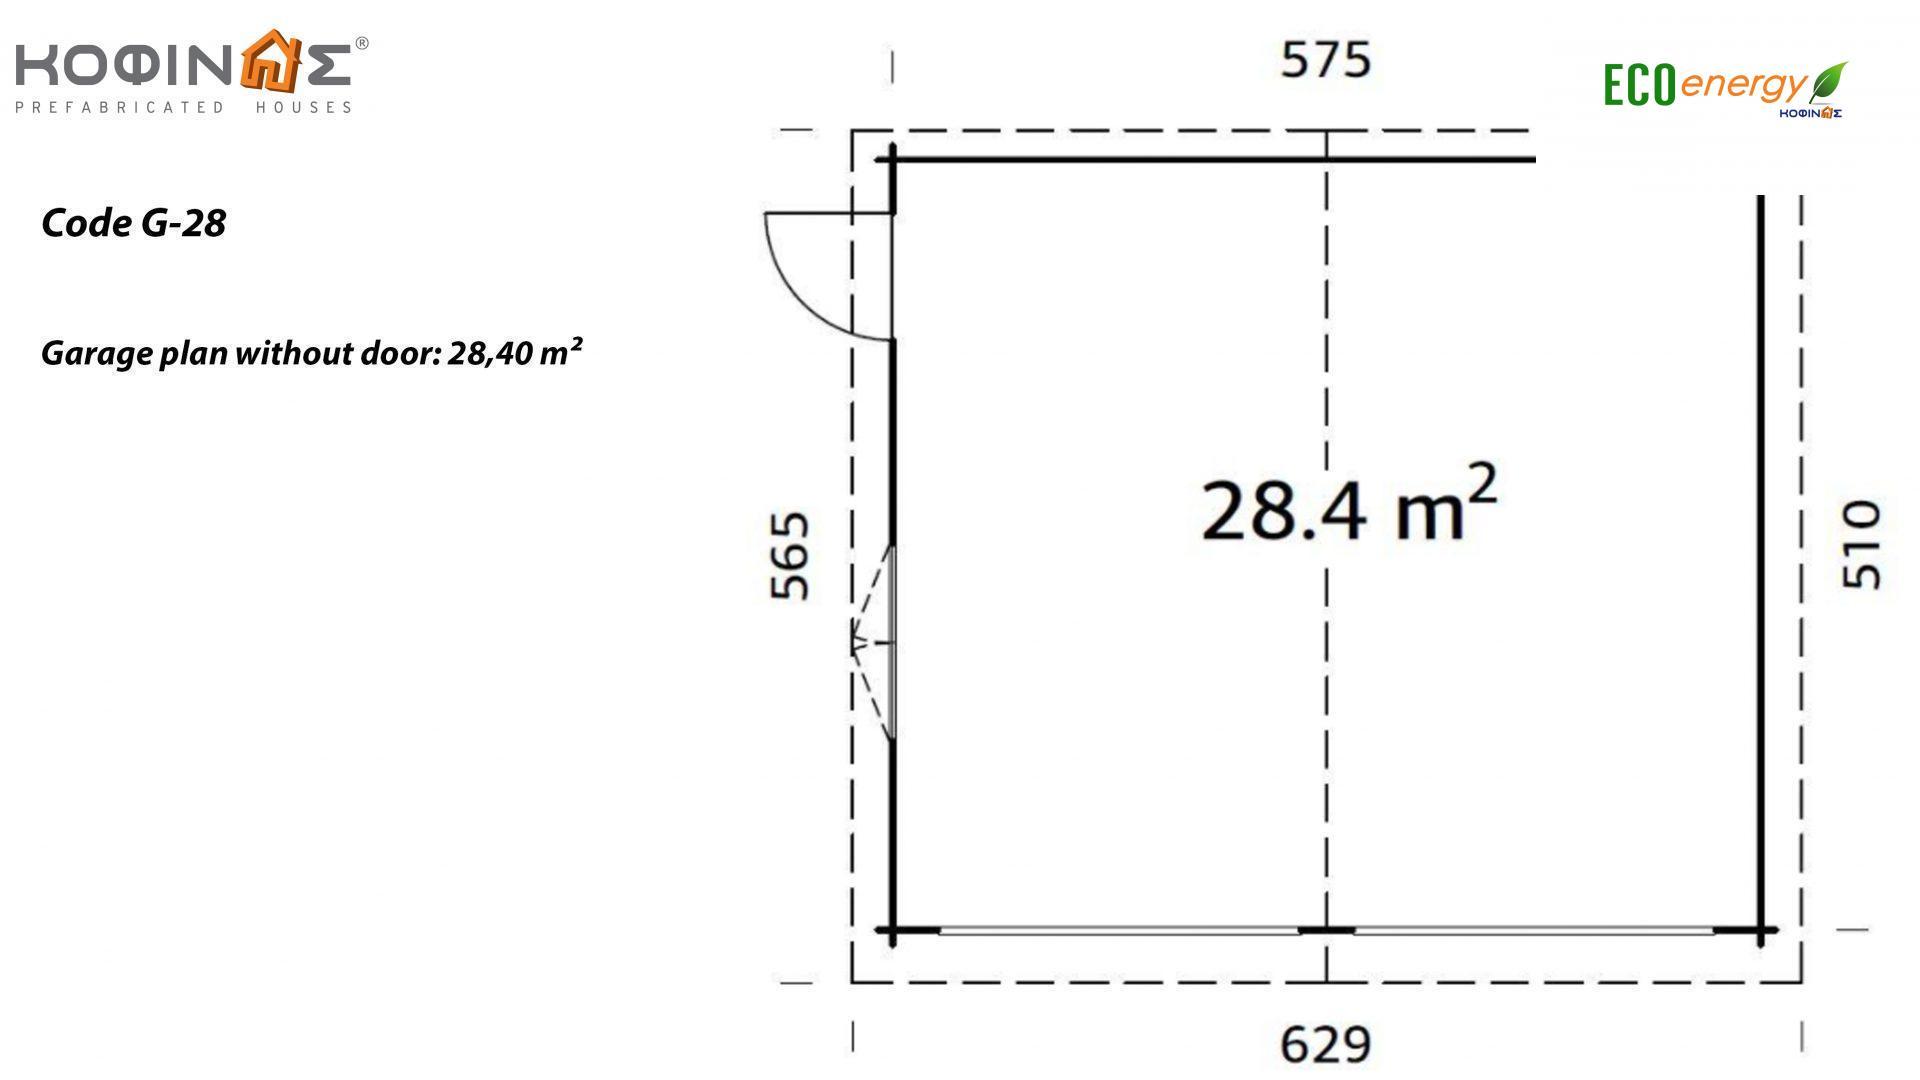 Garage G-28, total area 28.40 m²